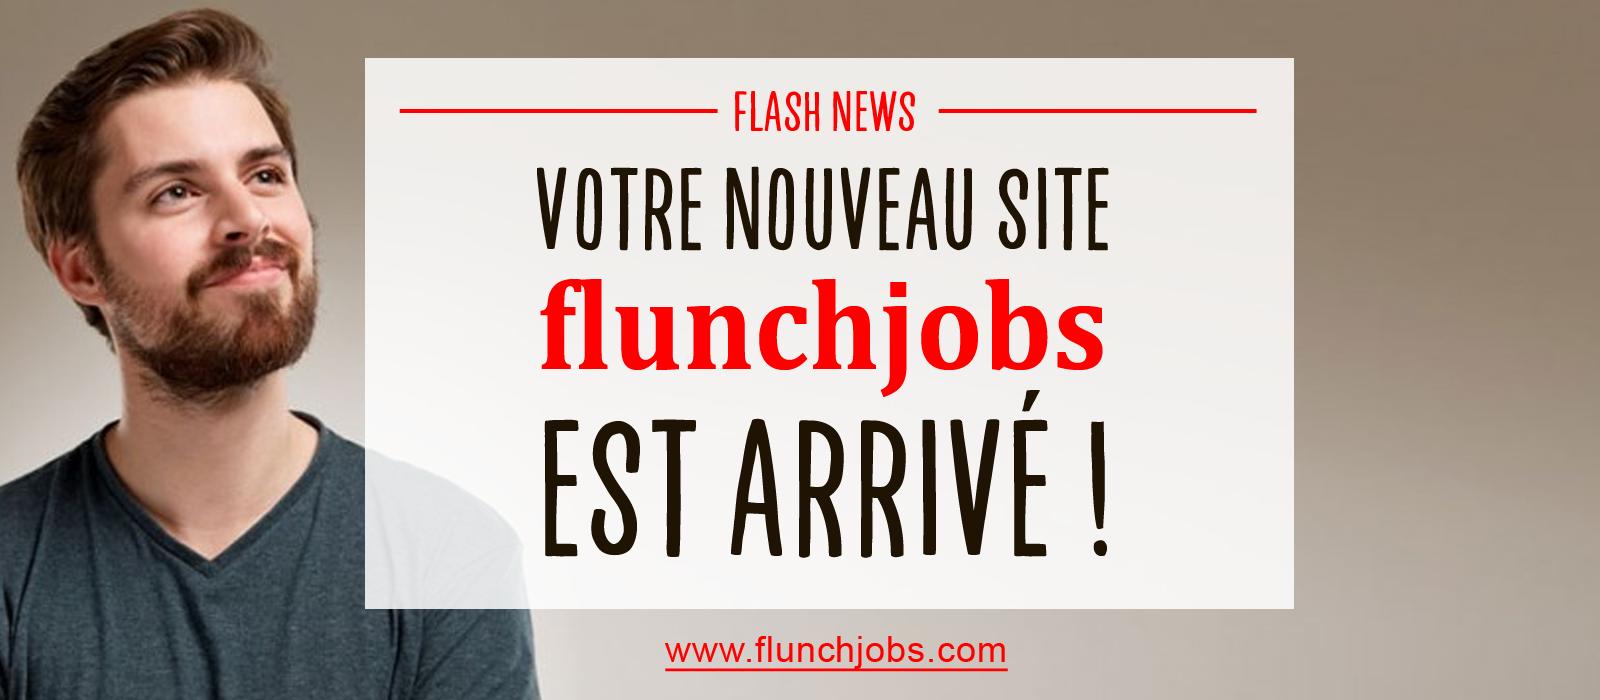 site de recrutement flunchjobs